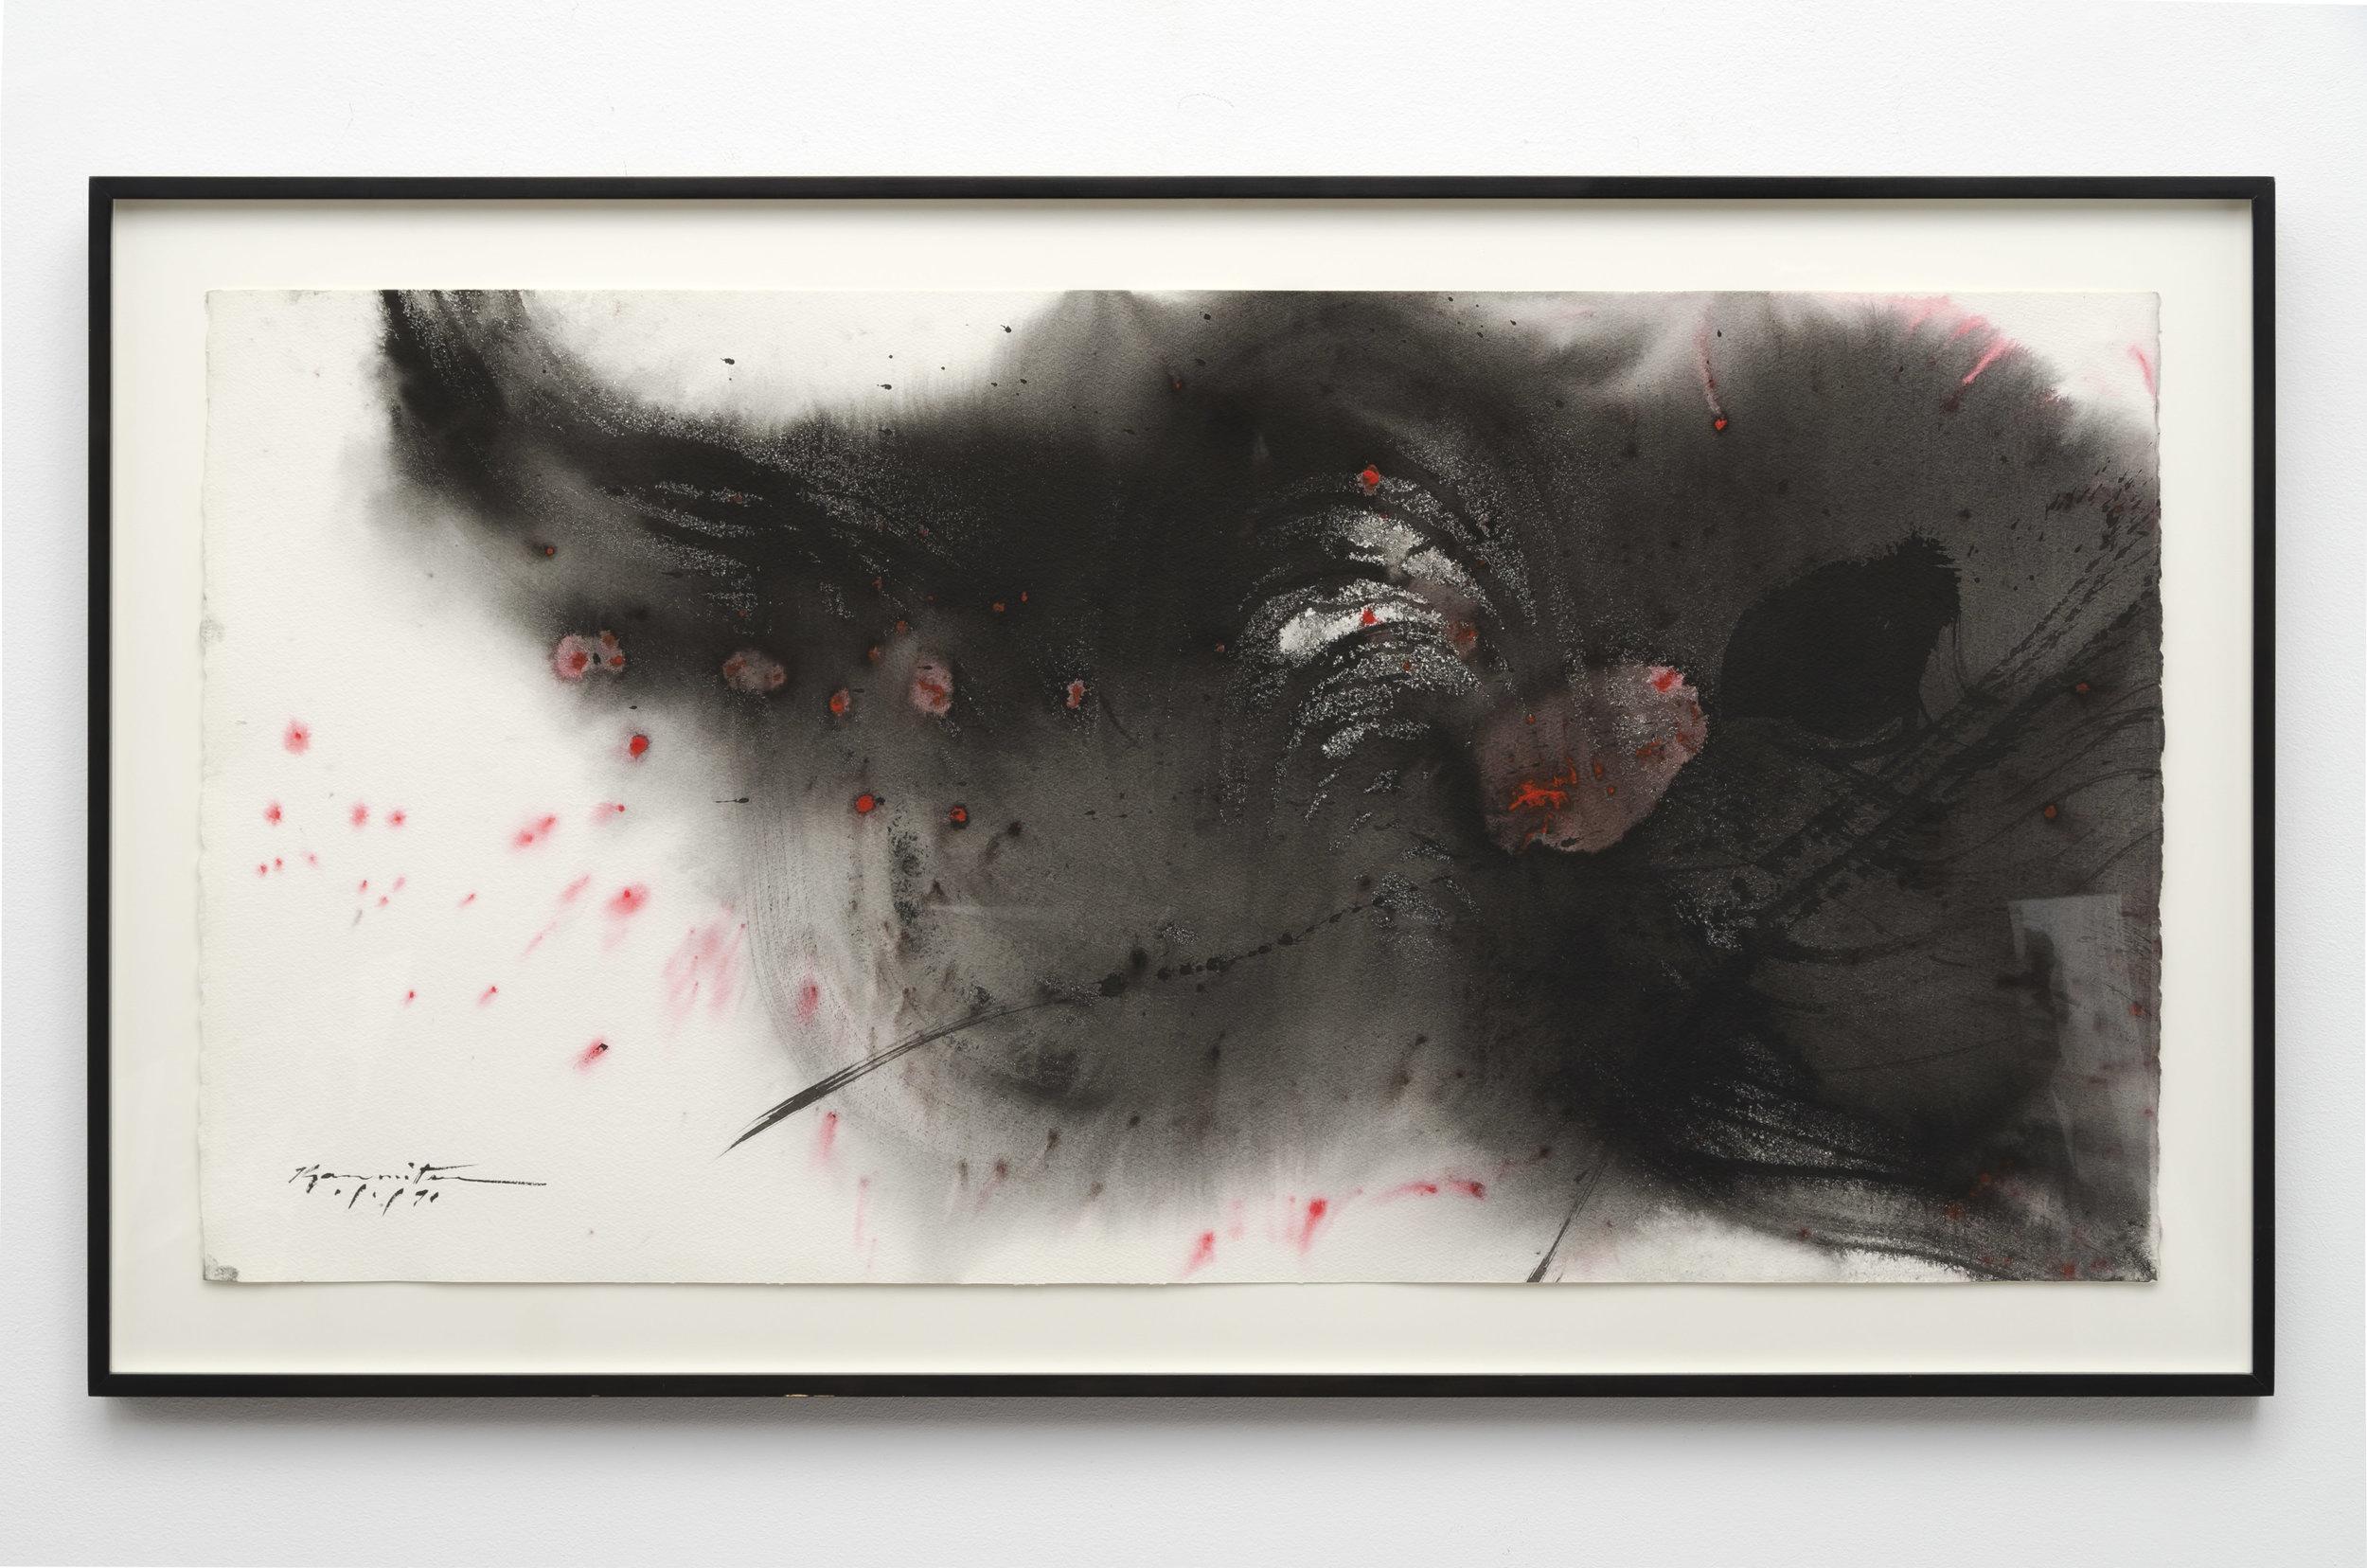 Matsumi Kanemitsu (1922-1992)   1-91 , 1991 sumi on paper 25 3/8 x 45 inches; 64.5 x 114.3 centimeters